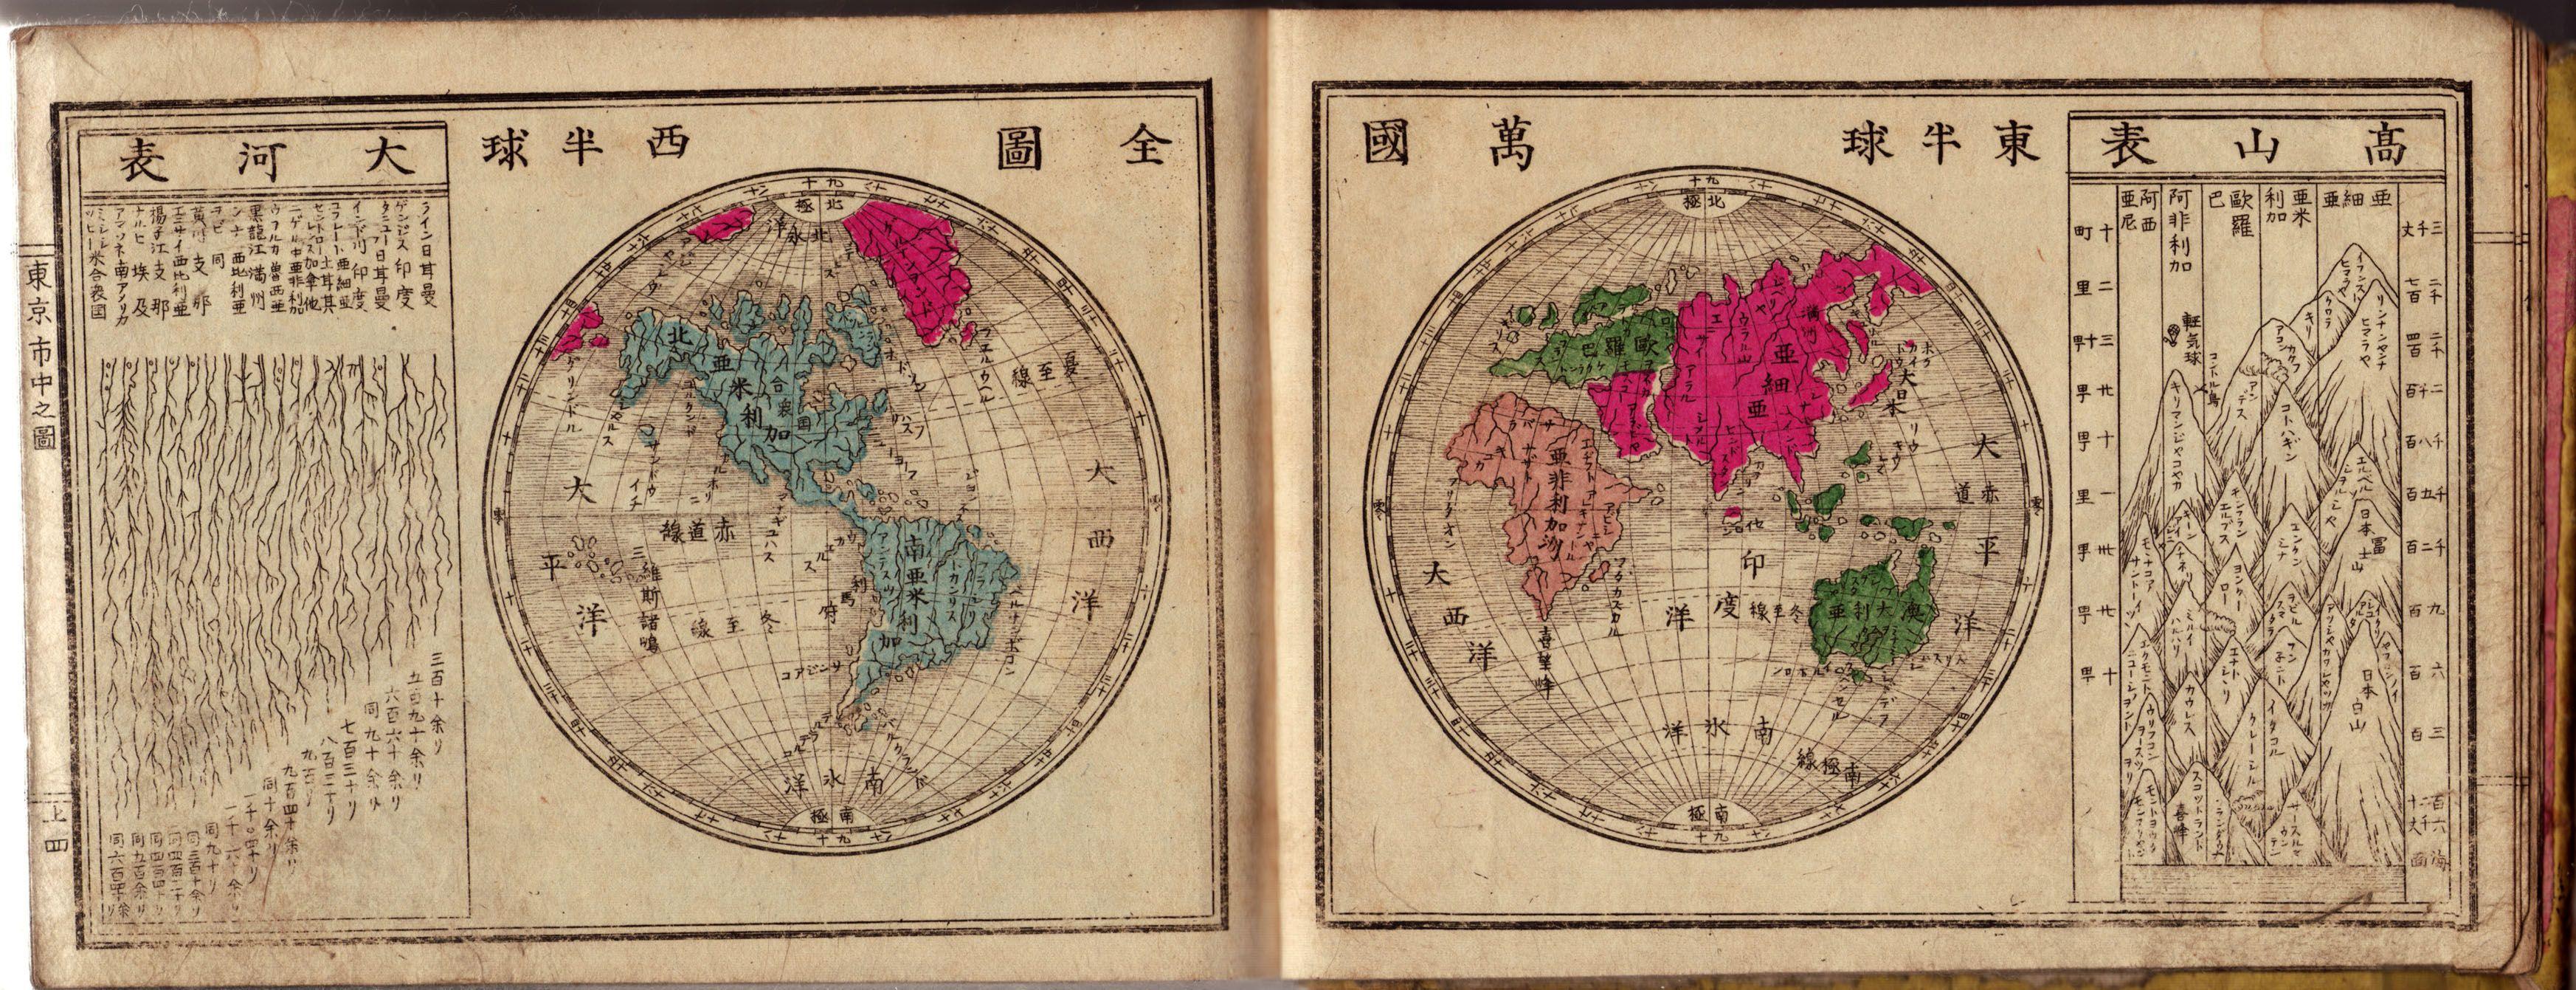 Japanese almanac world map 1883 mapas pinterest mapas japanese almanac world map 1883 gumiabroncs Images